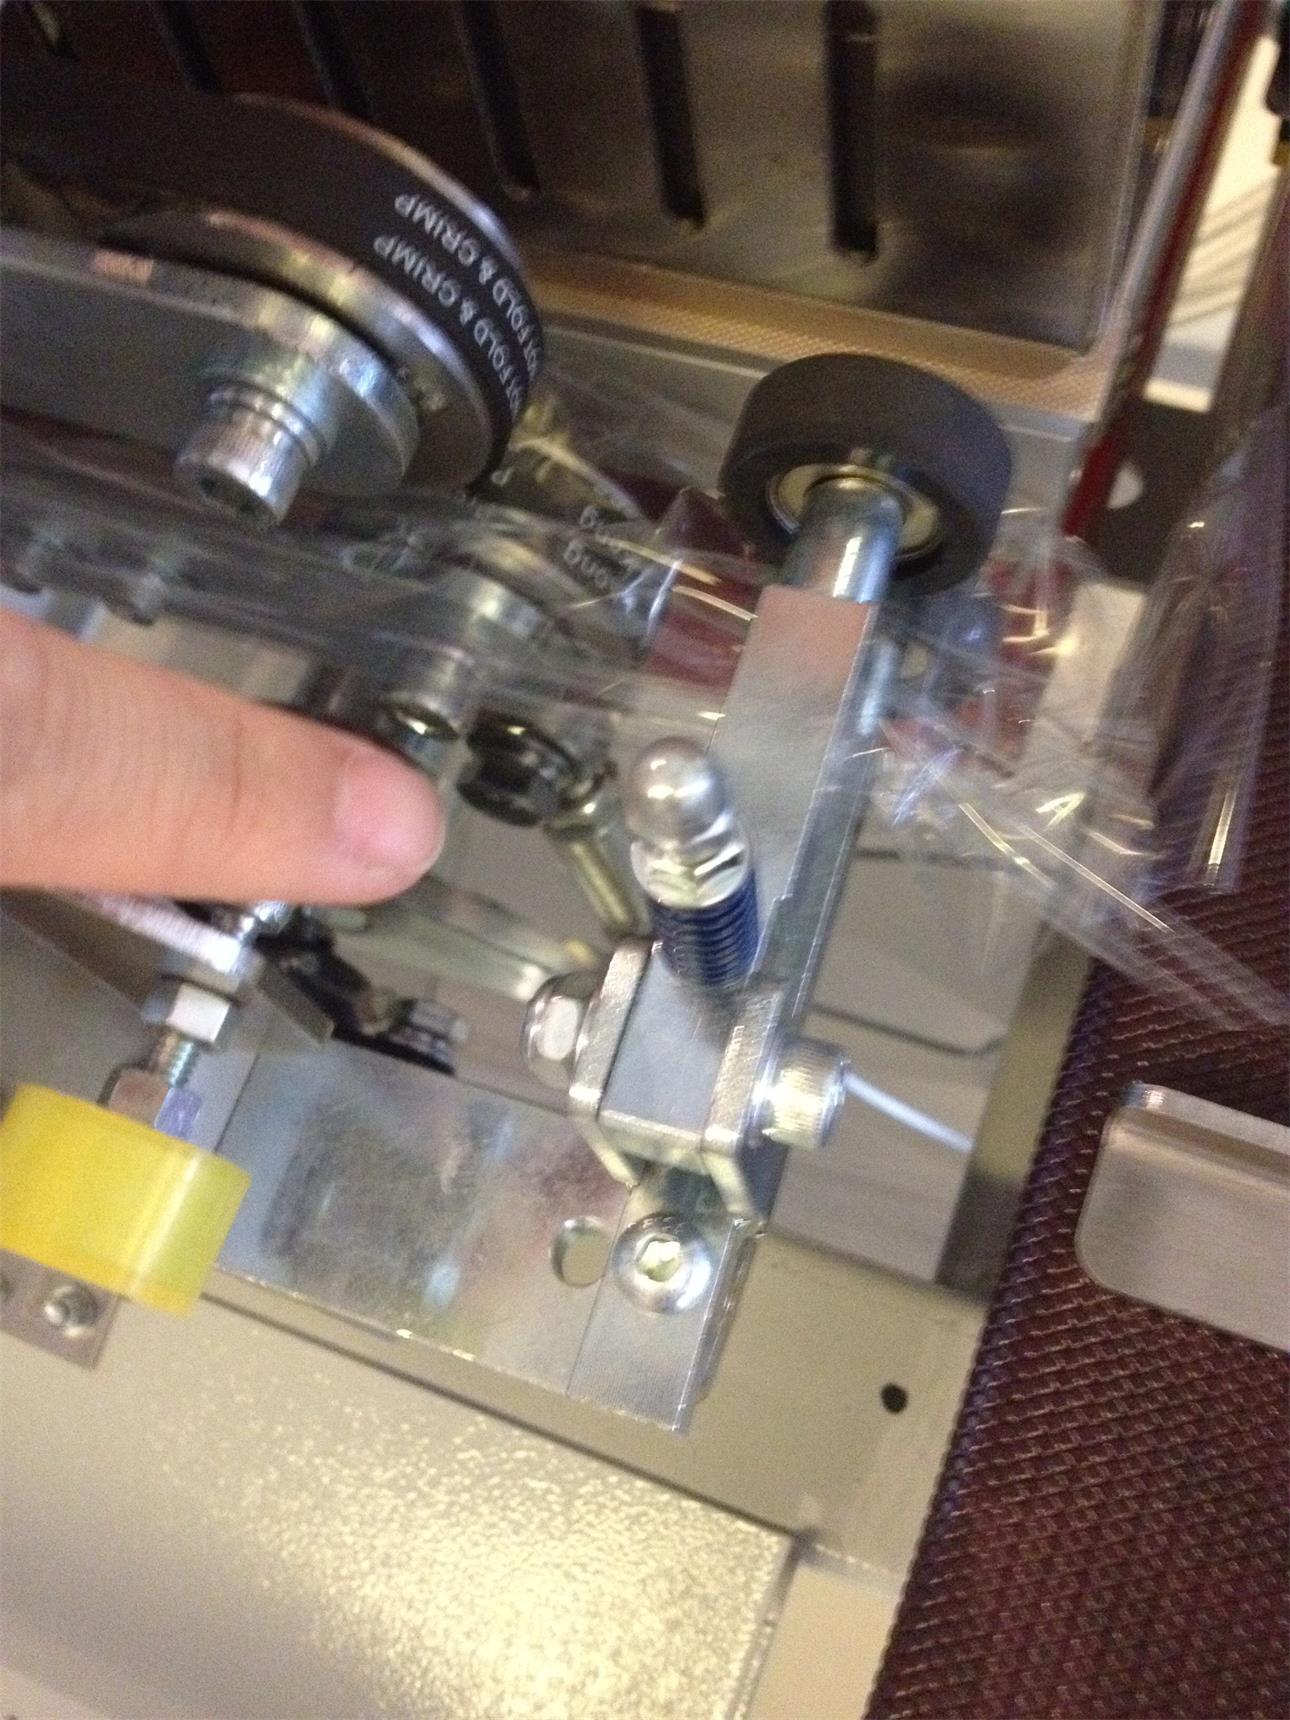 2 in 1 Mini Shrink Packaging Machine